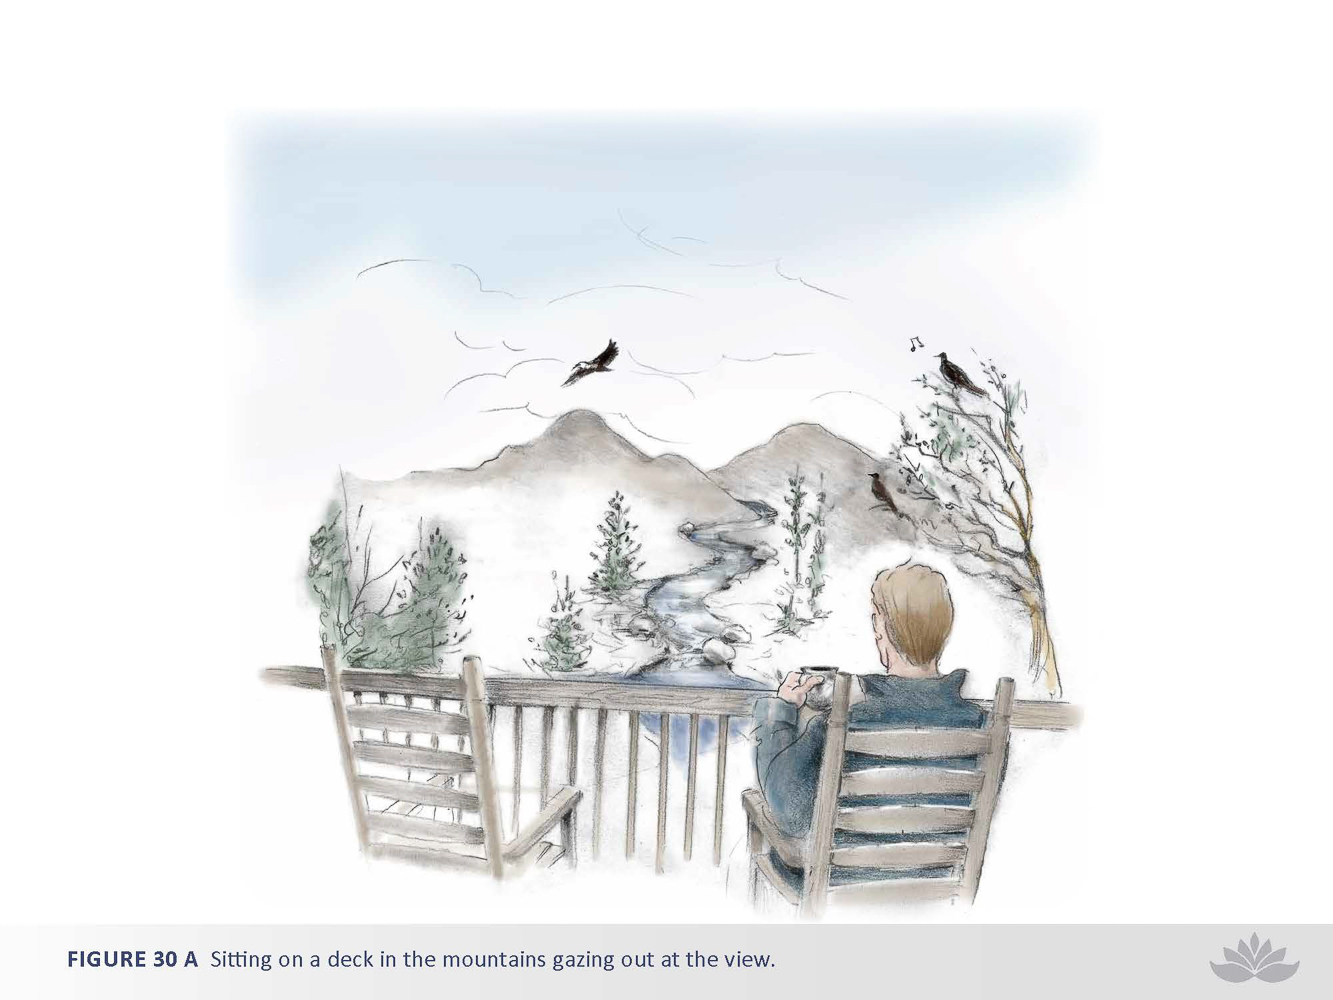 nwd-illustration-08-3.jpg